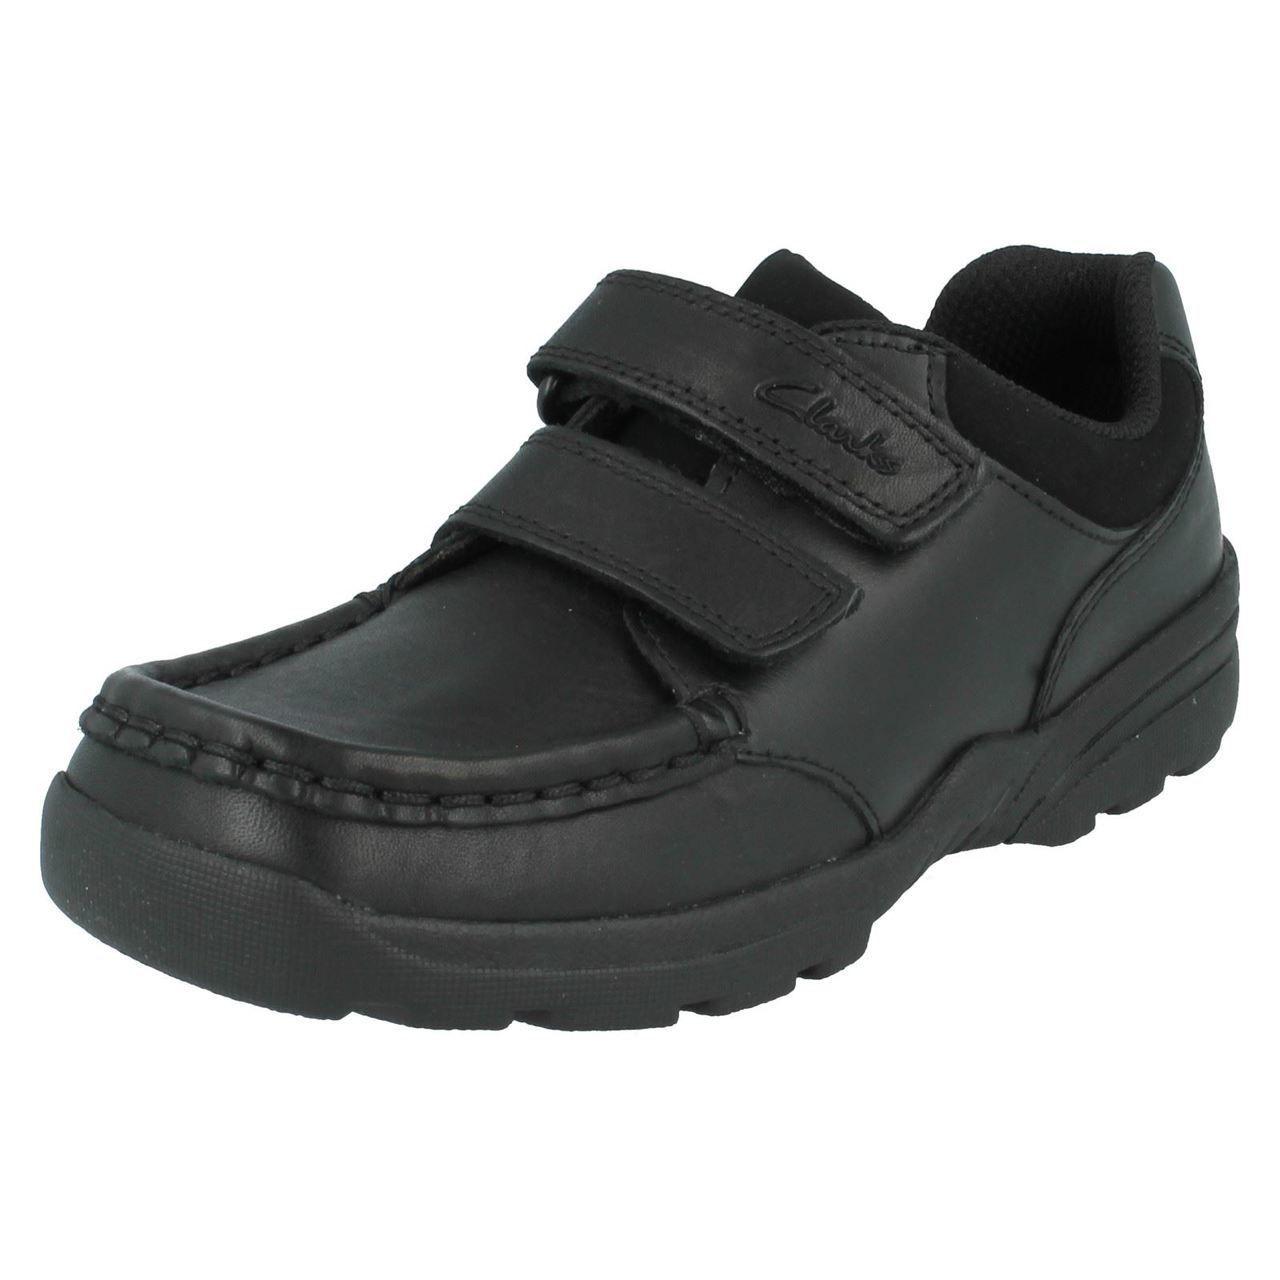 Boys Clarks Shoes Zayden Go